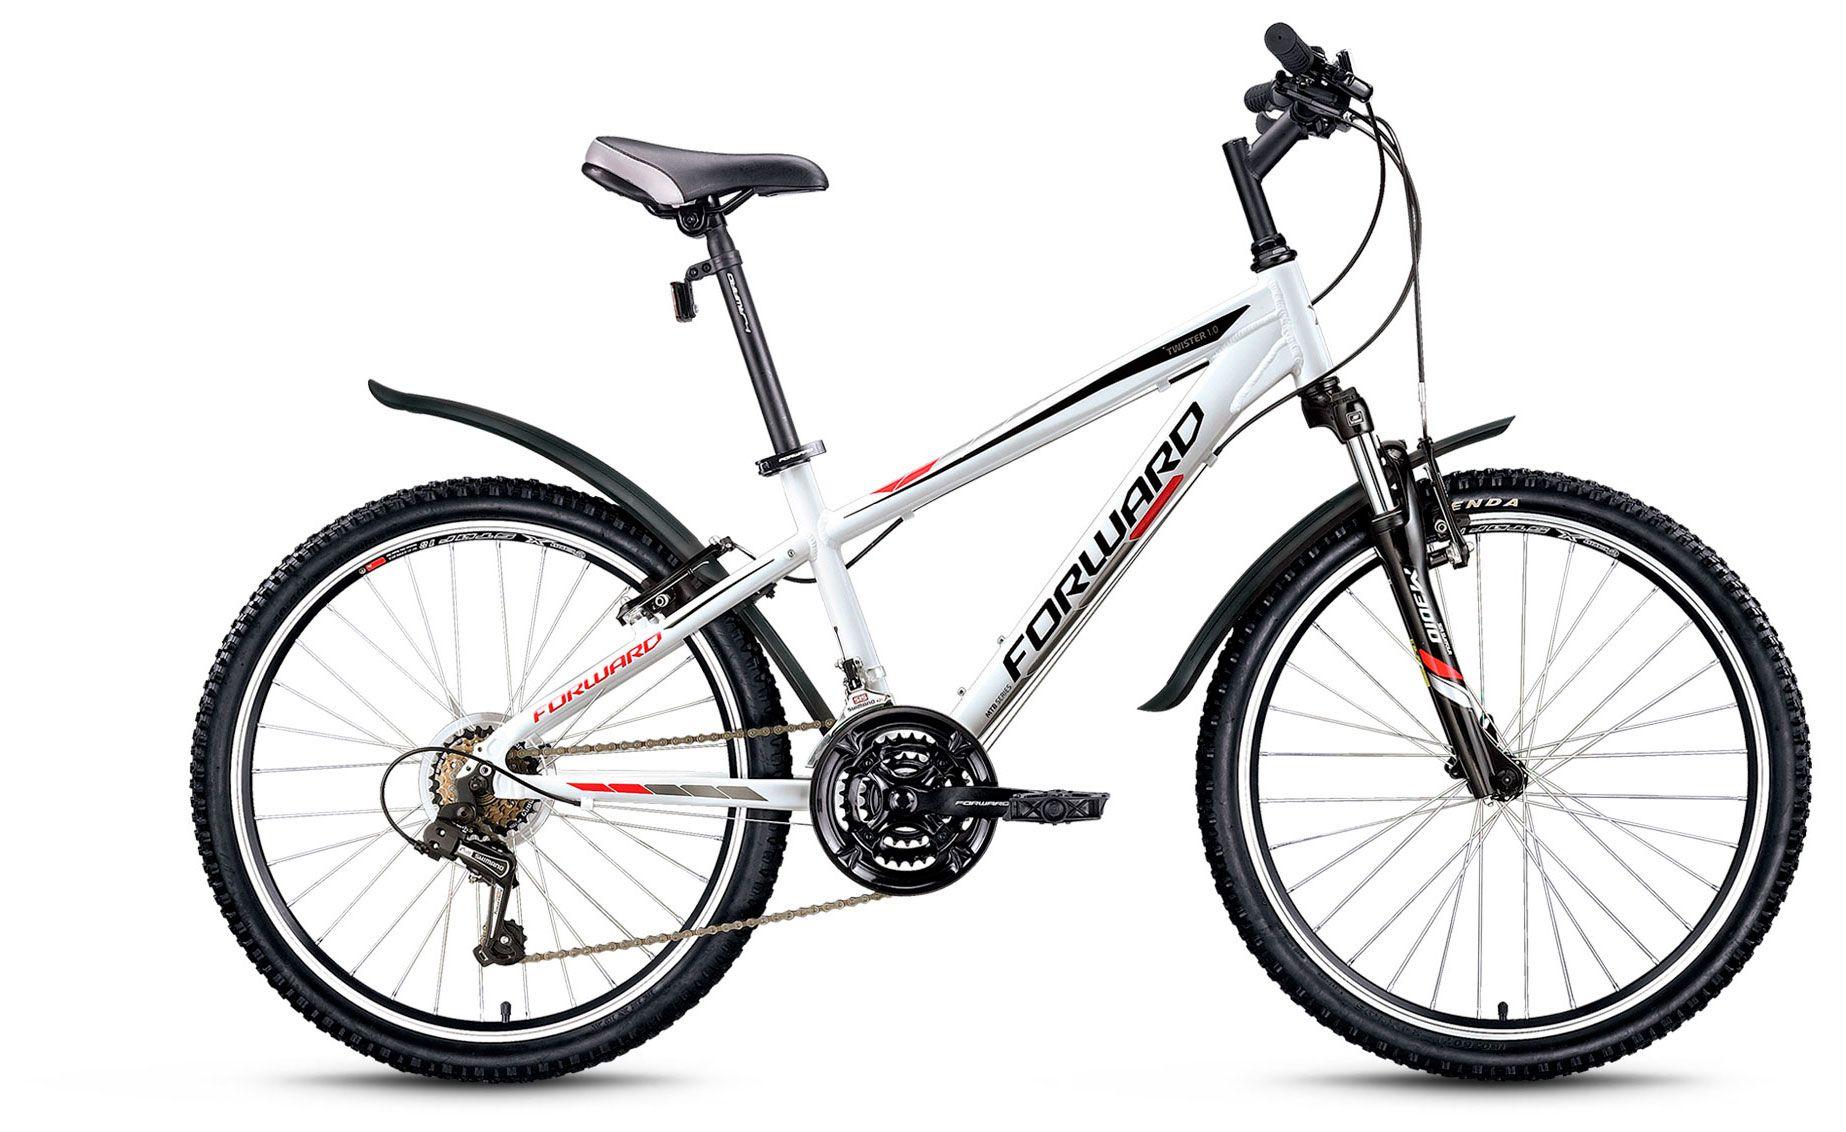 Велосипед Forward Twister 1.0 2018 велосипед forward rivera 1 0 2018